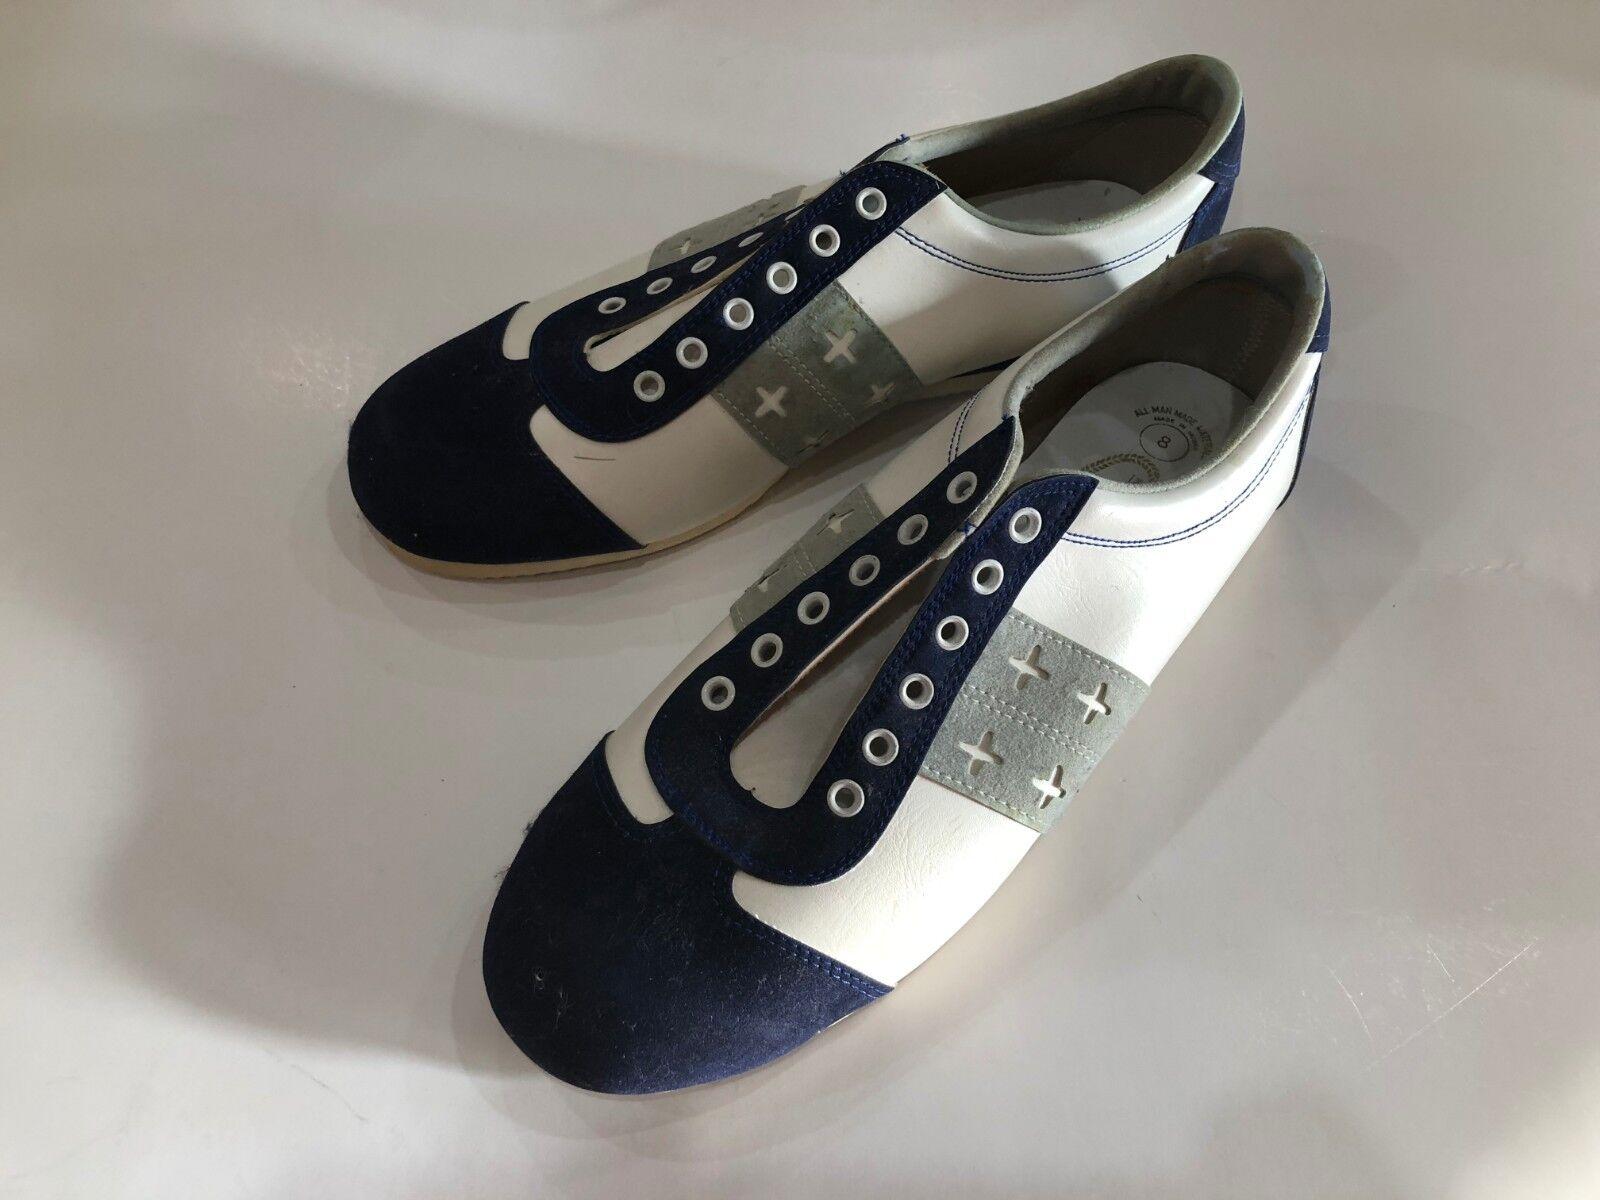 VTG NOS MATT ANDREWS Sneakers Tennis shoes NOS Mens 8